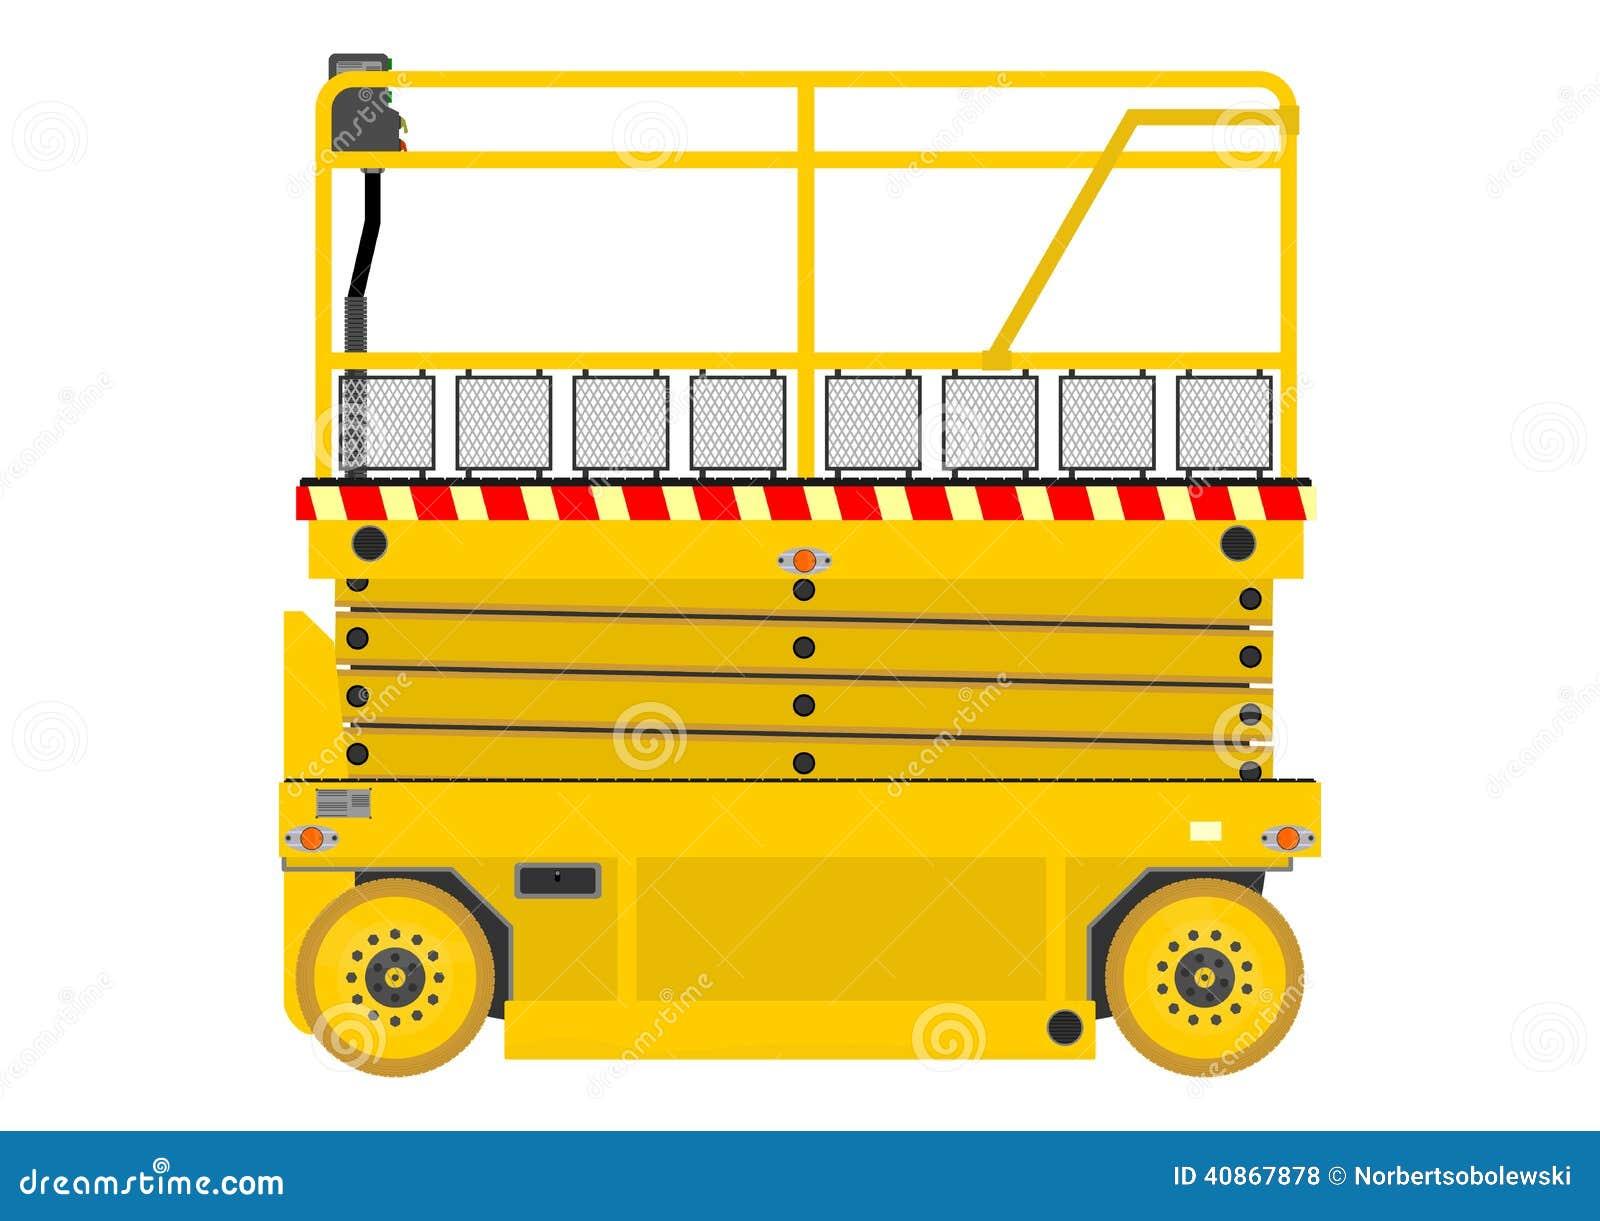 Lift Gate Pump Motor Wiring Diagram Diagrams For Dummies Truck Eagle Brass Hydraulic